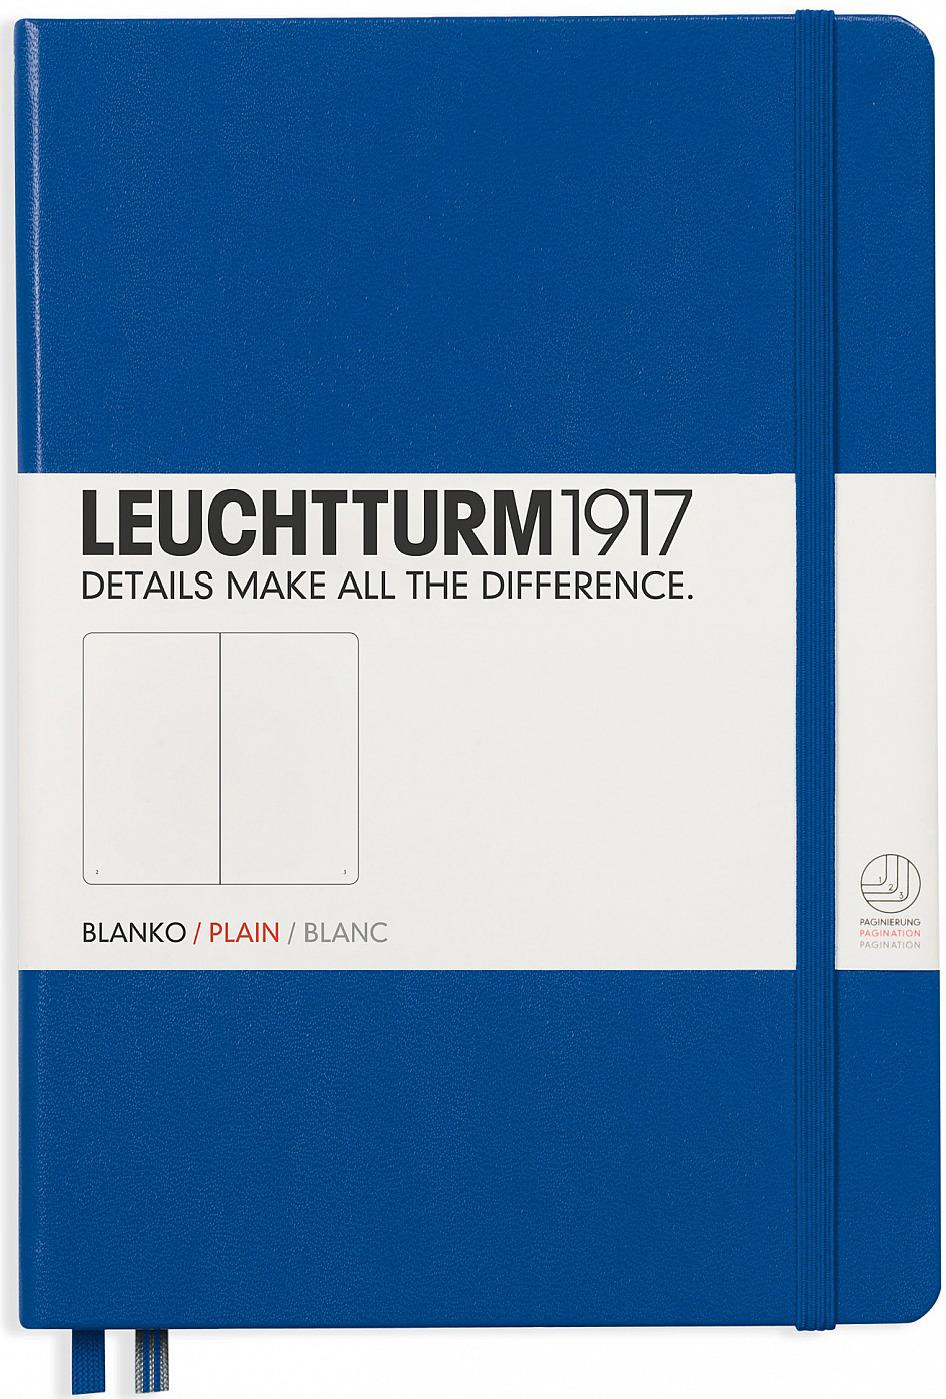 Записная книжка Leuchtturm1917, 342705, синий, A5 (148 x 210 мм), без разметки, 126 листов